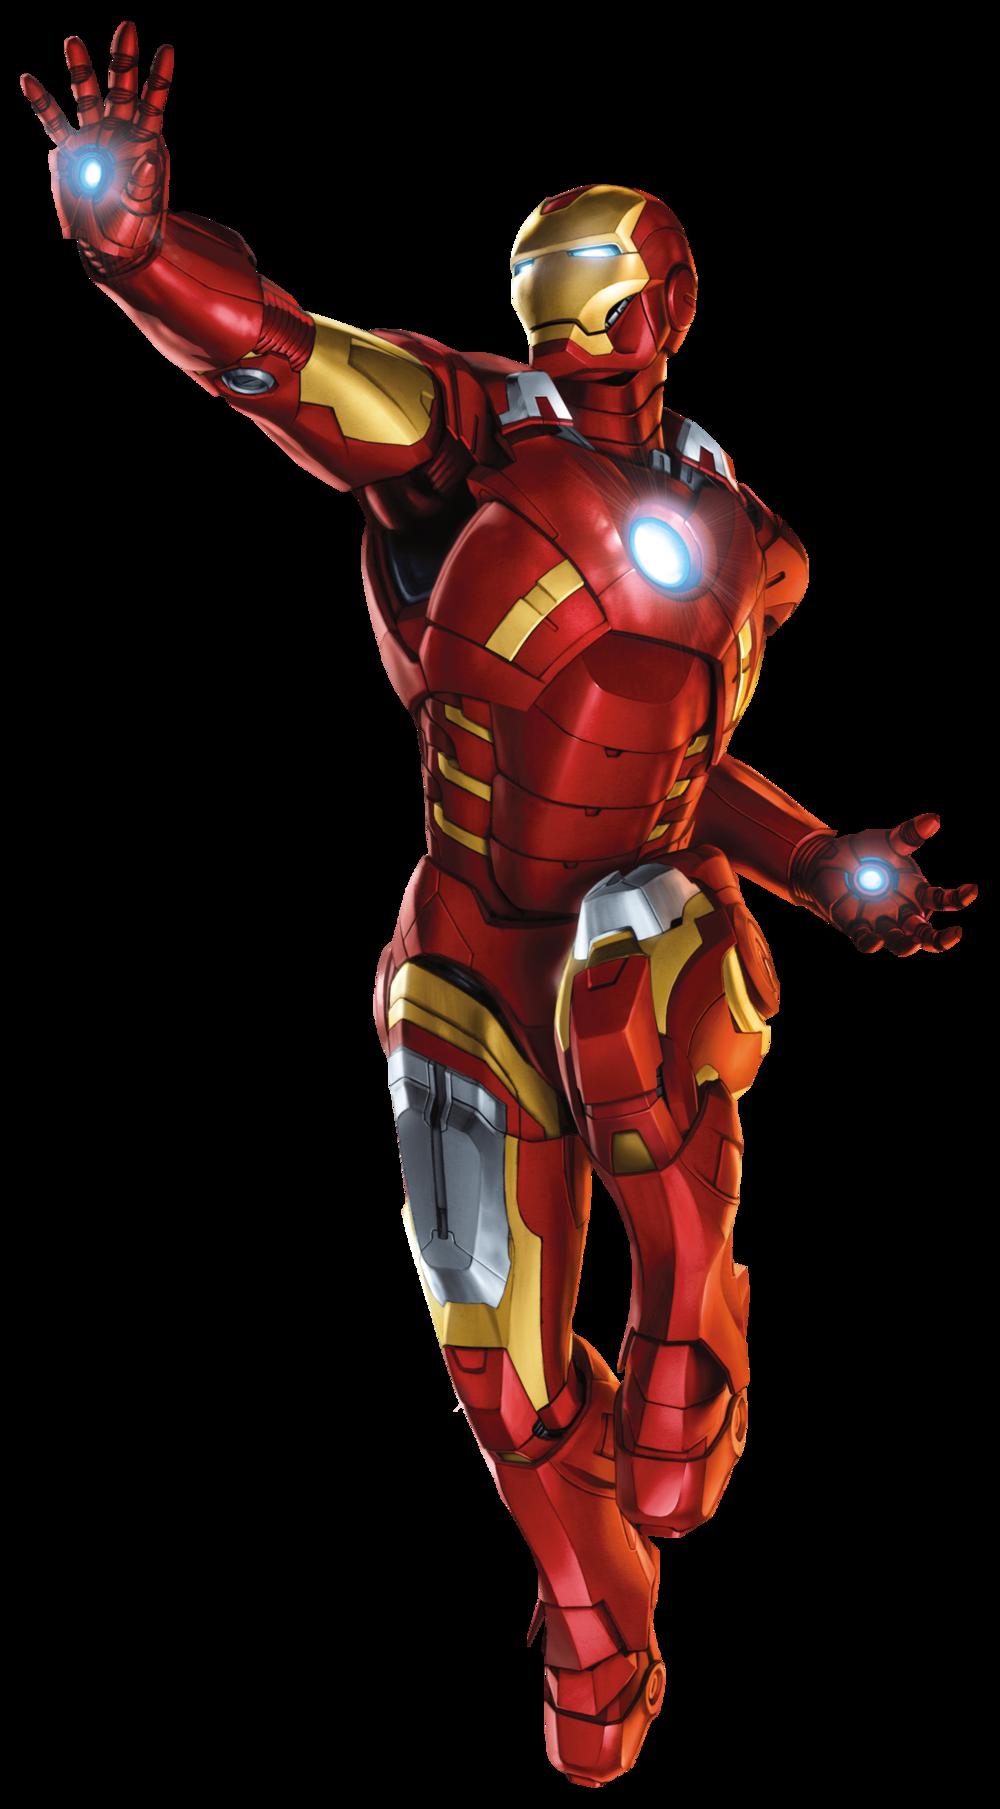 Iron Man/Gallery Disney Wiki Iron man, Marvel iron man